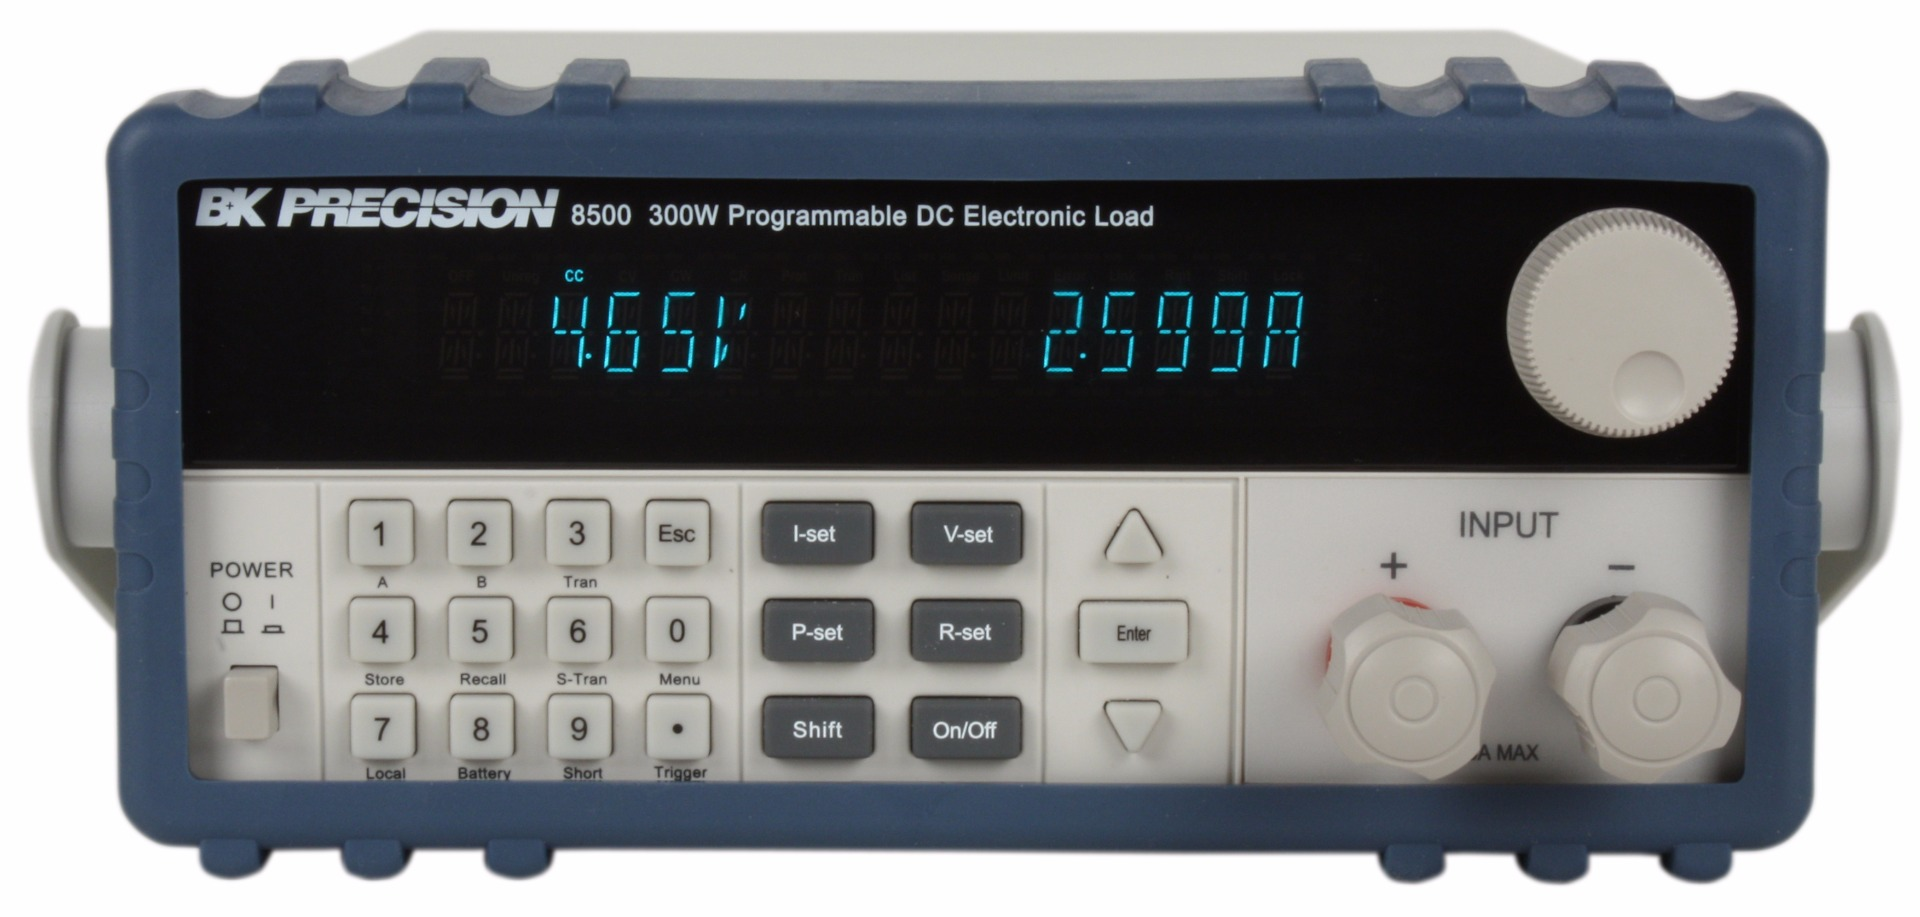 Image of BK-Precision-8520 by Valuetronics International Inc